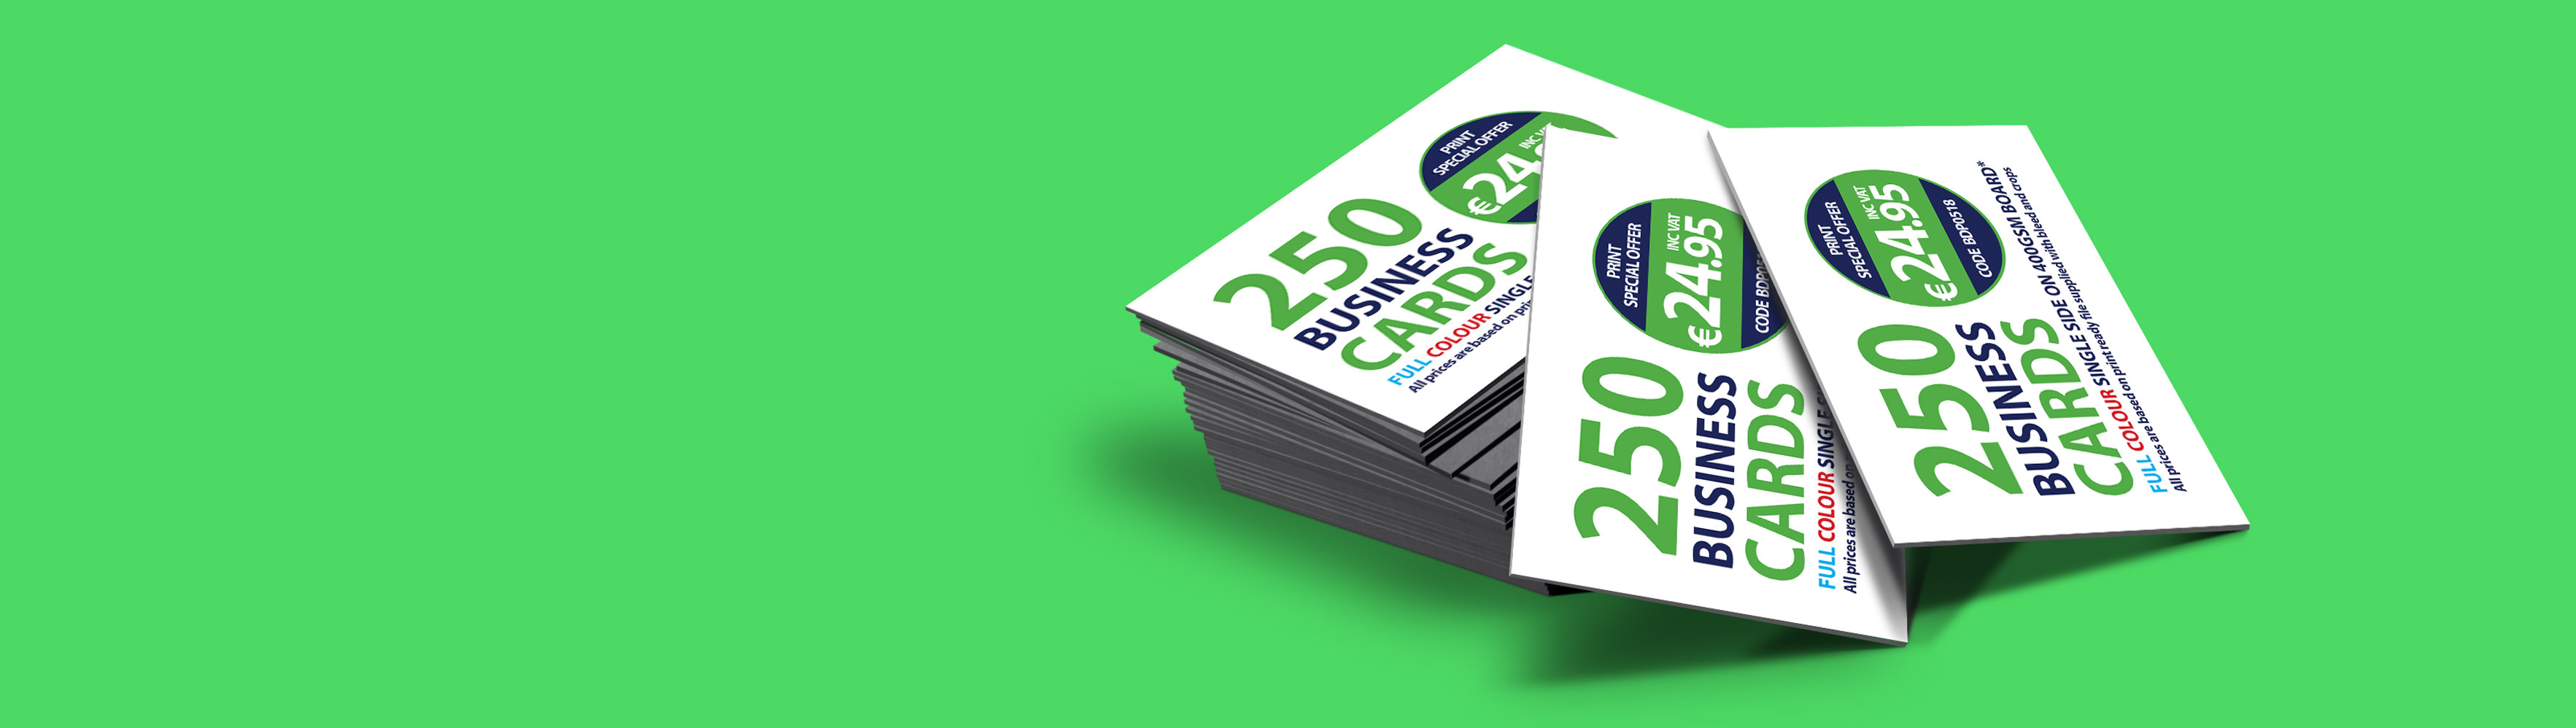 Printfix print design company brochures business stationary 2 reheart Choice Image